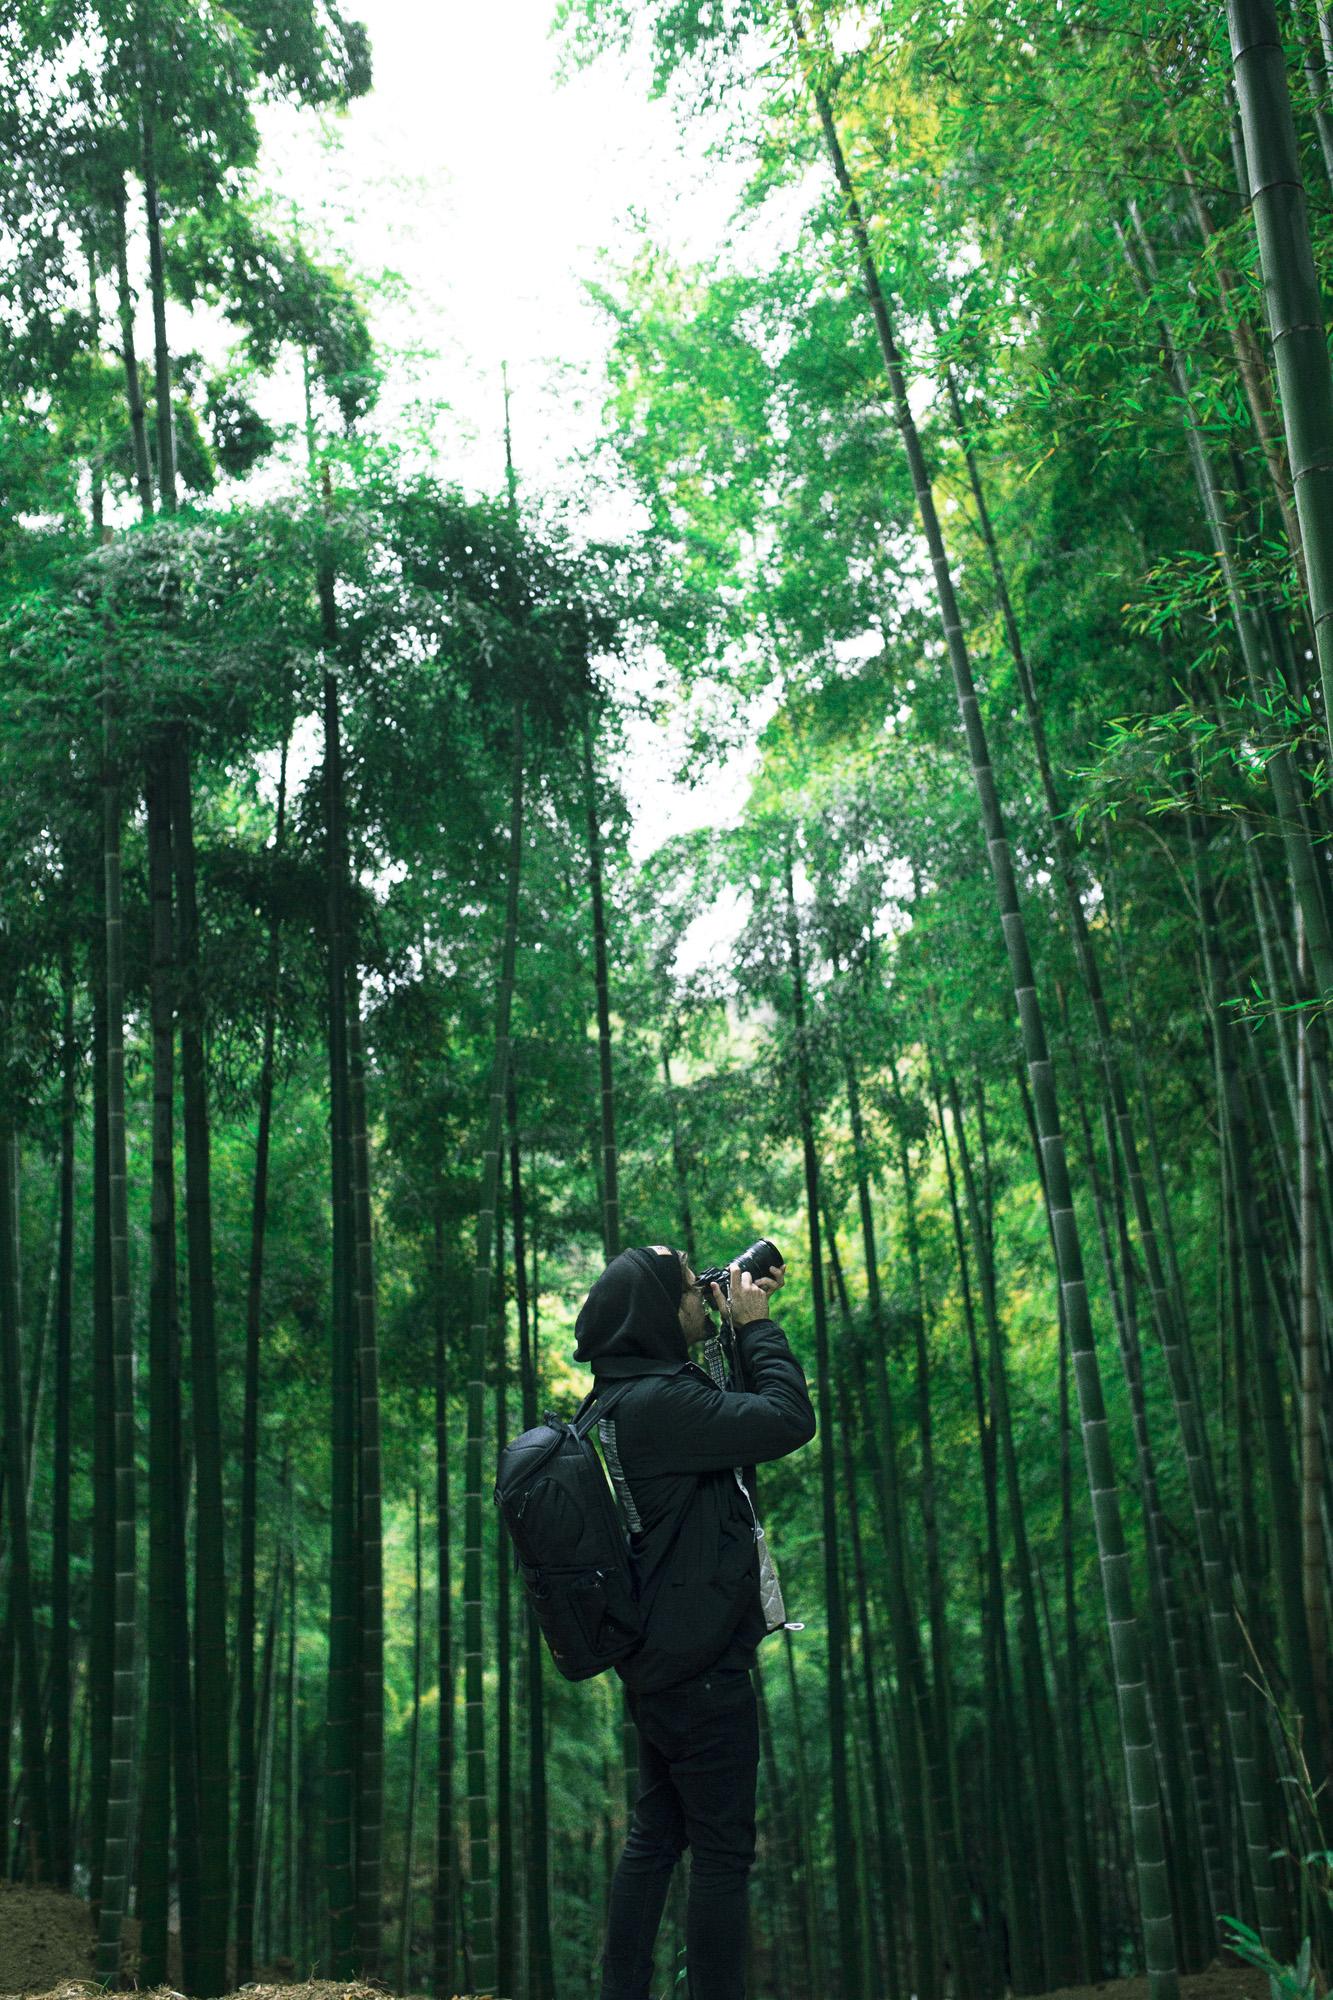 KYT_Me_Bamboo.jpg